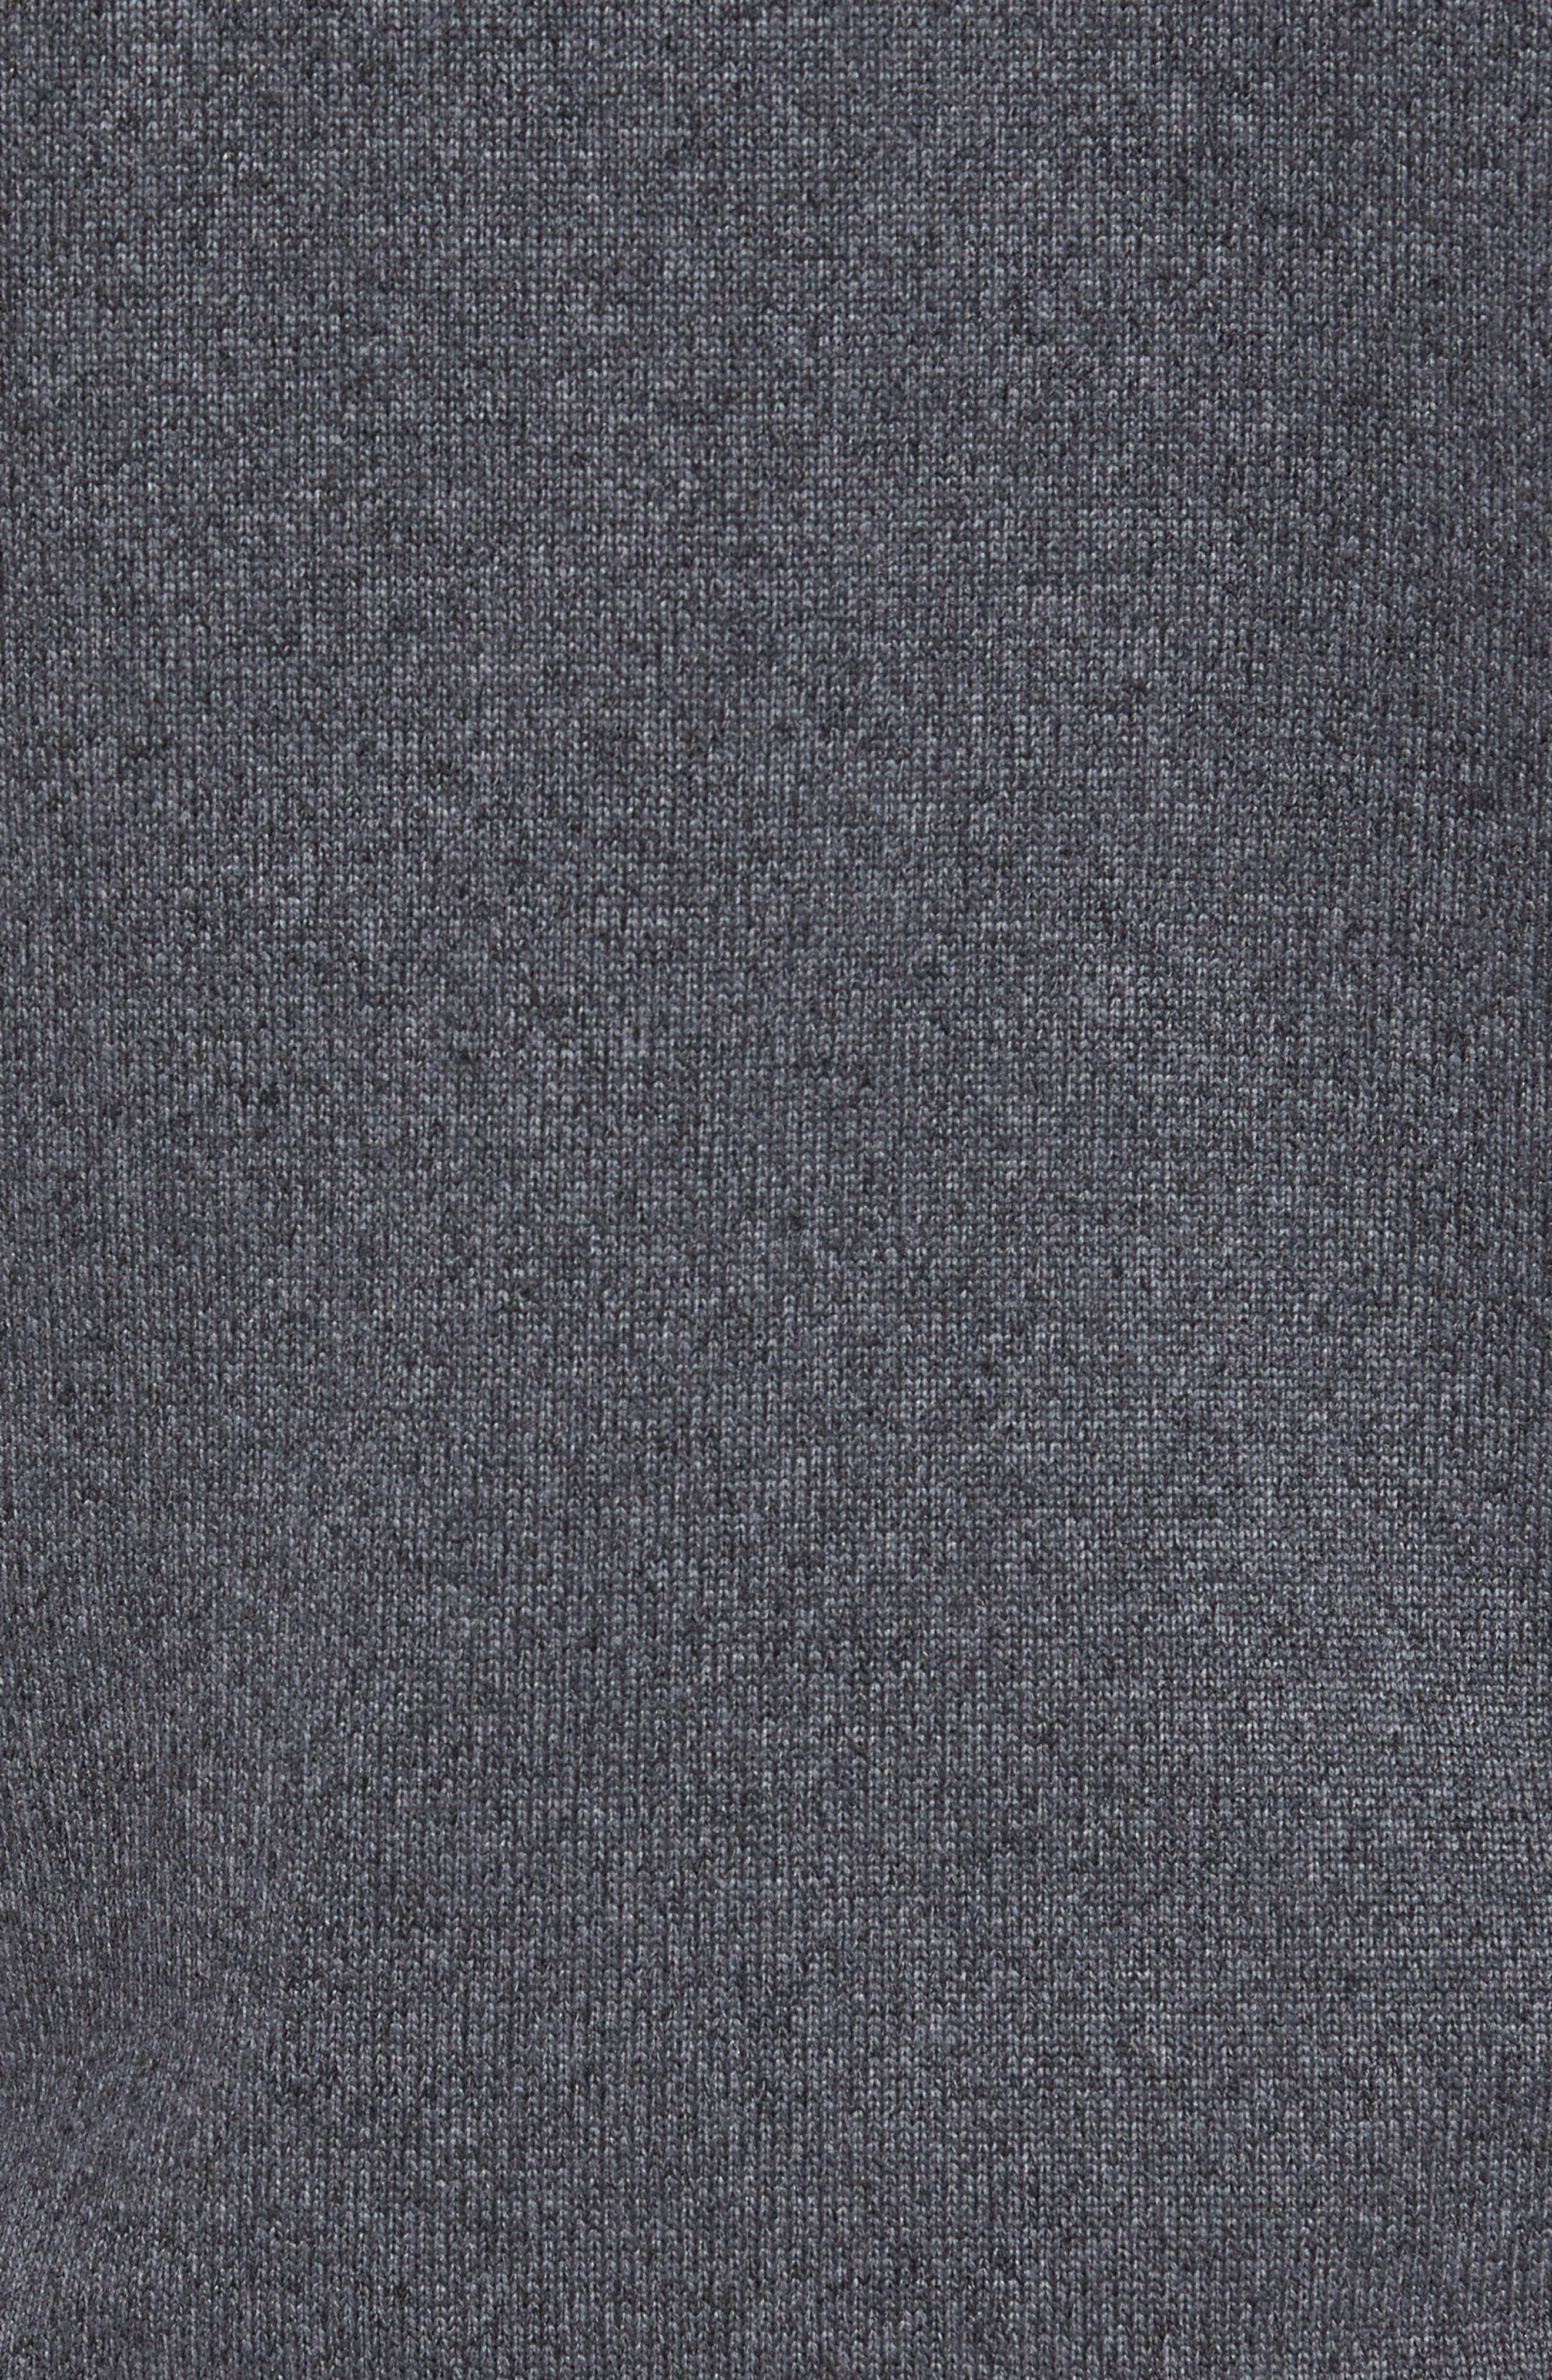 Alternate Image 5  - vineyard vines Tech Sweater Fleece Vest